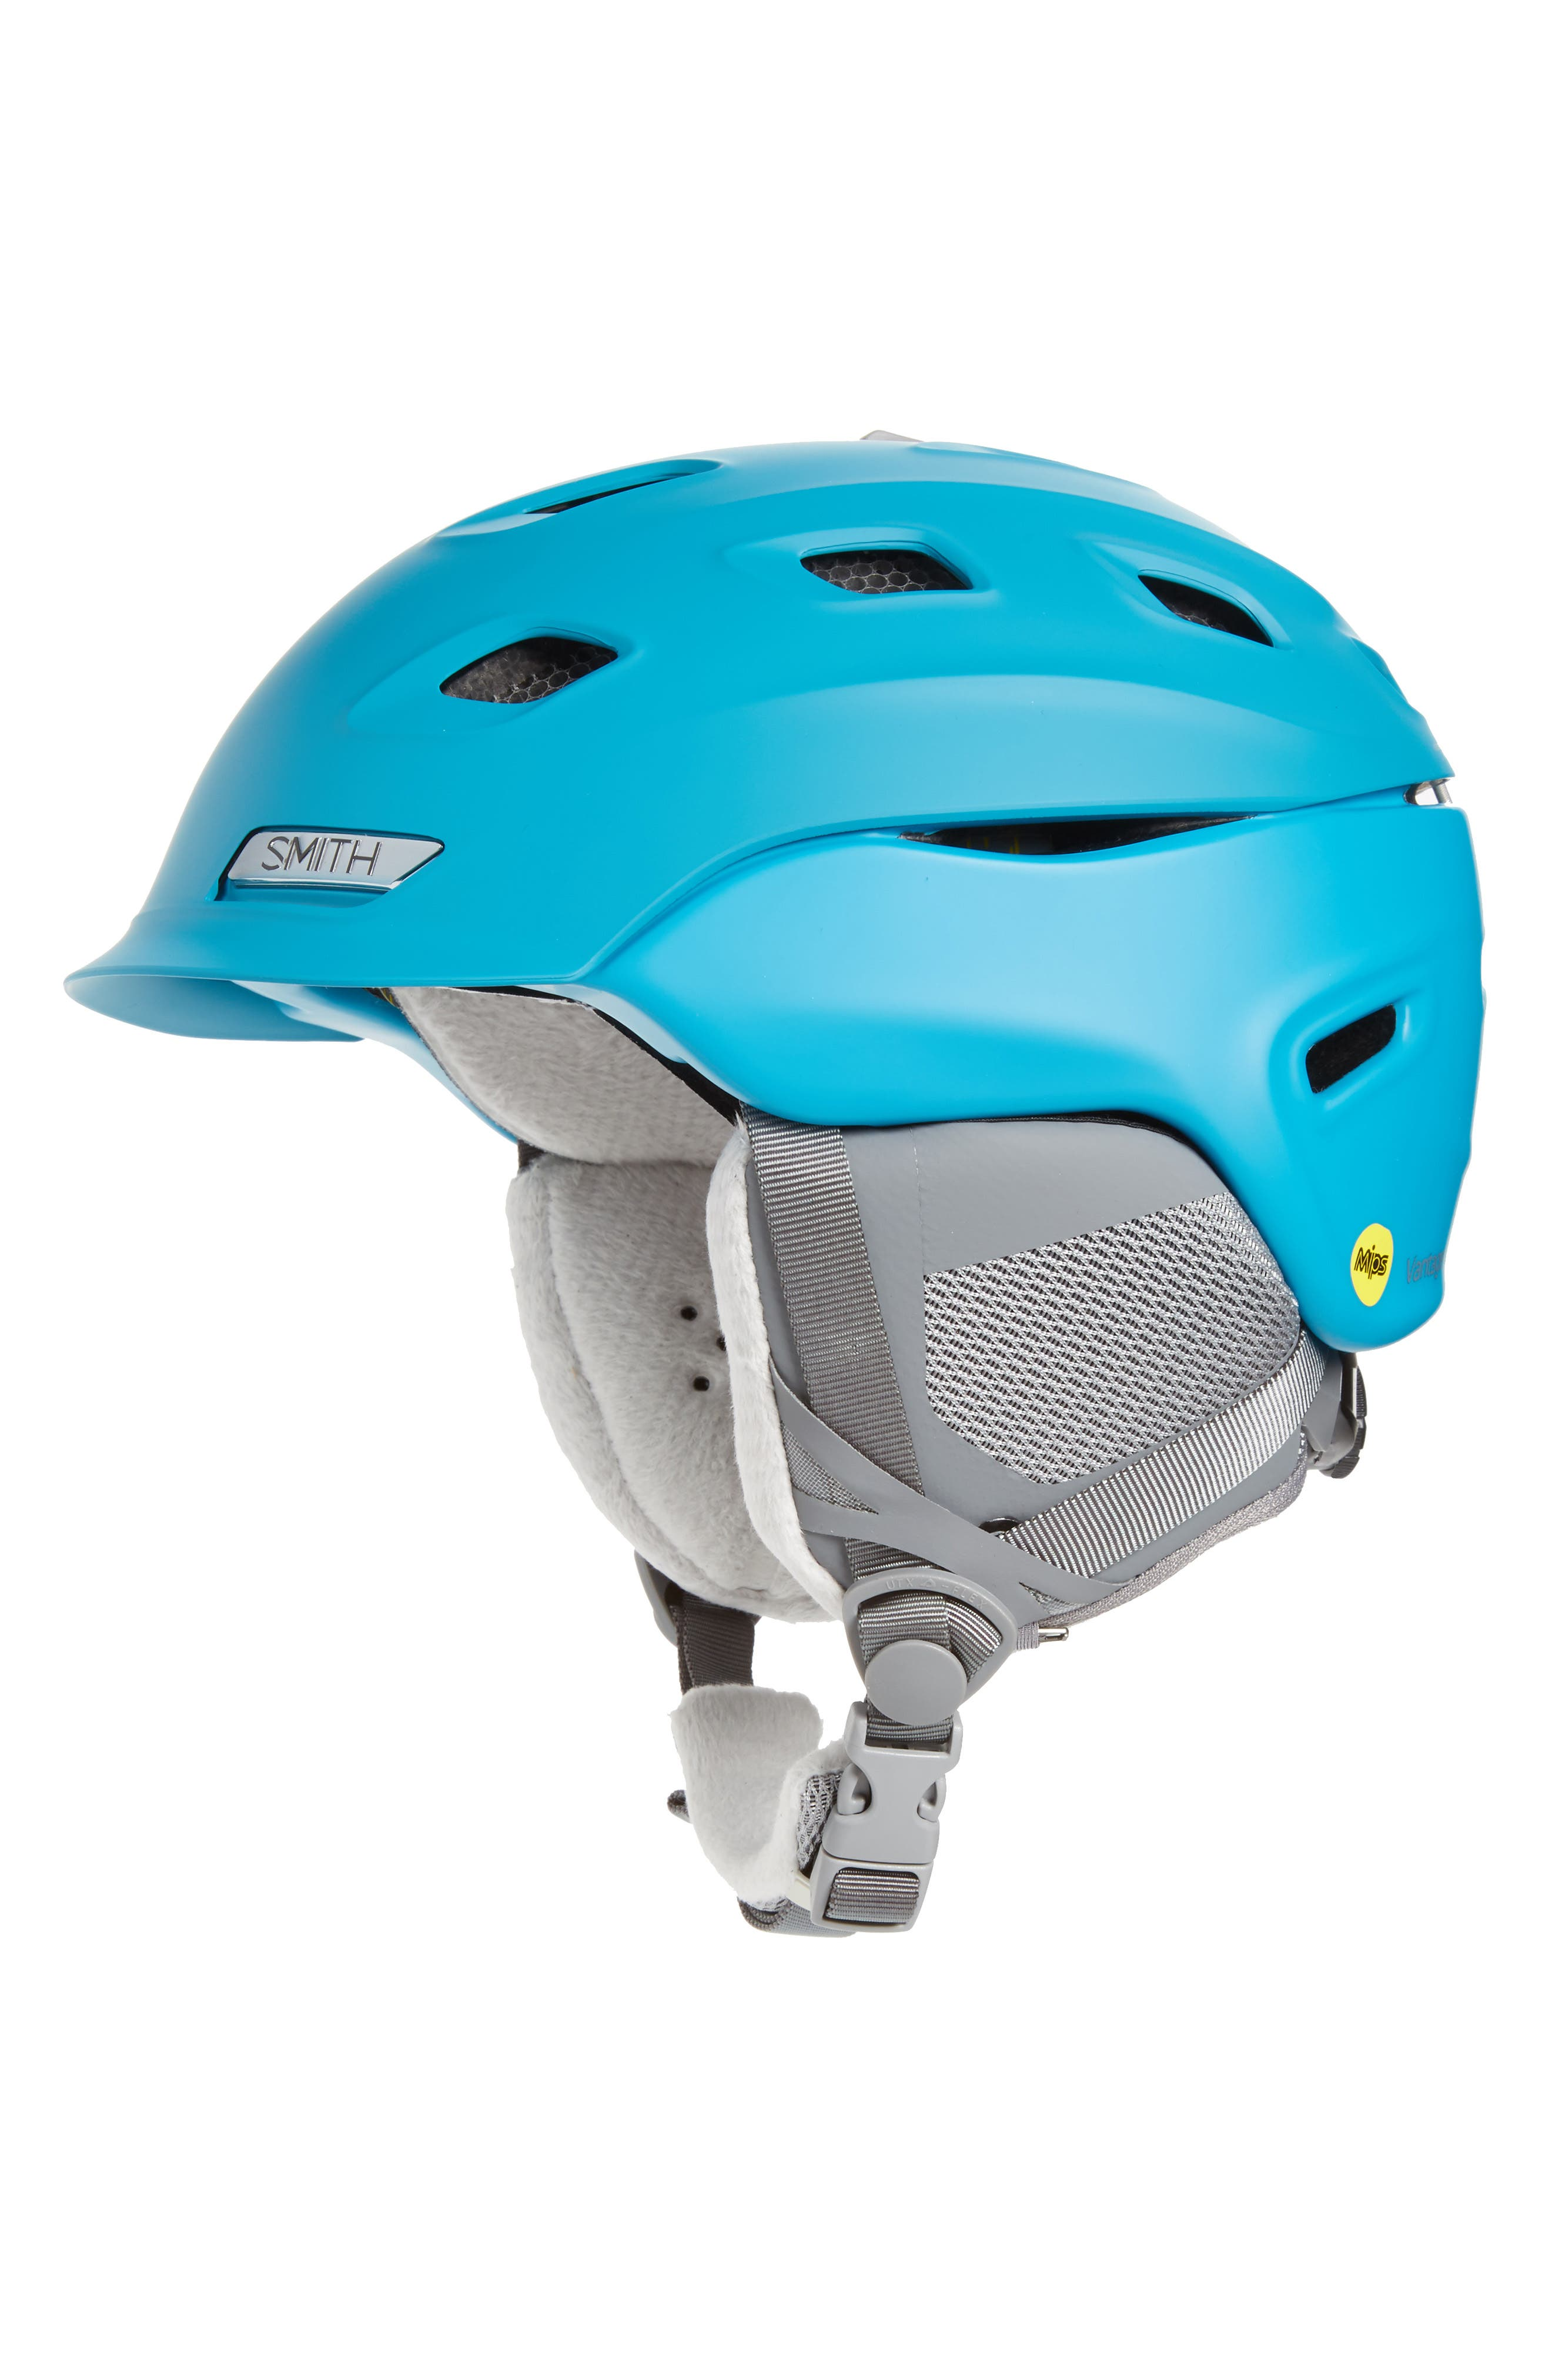 Smith Vantage Snow Helmet with MIPS (Women)